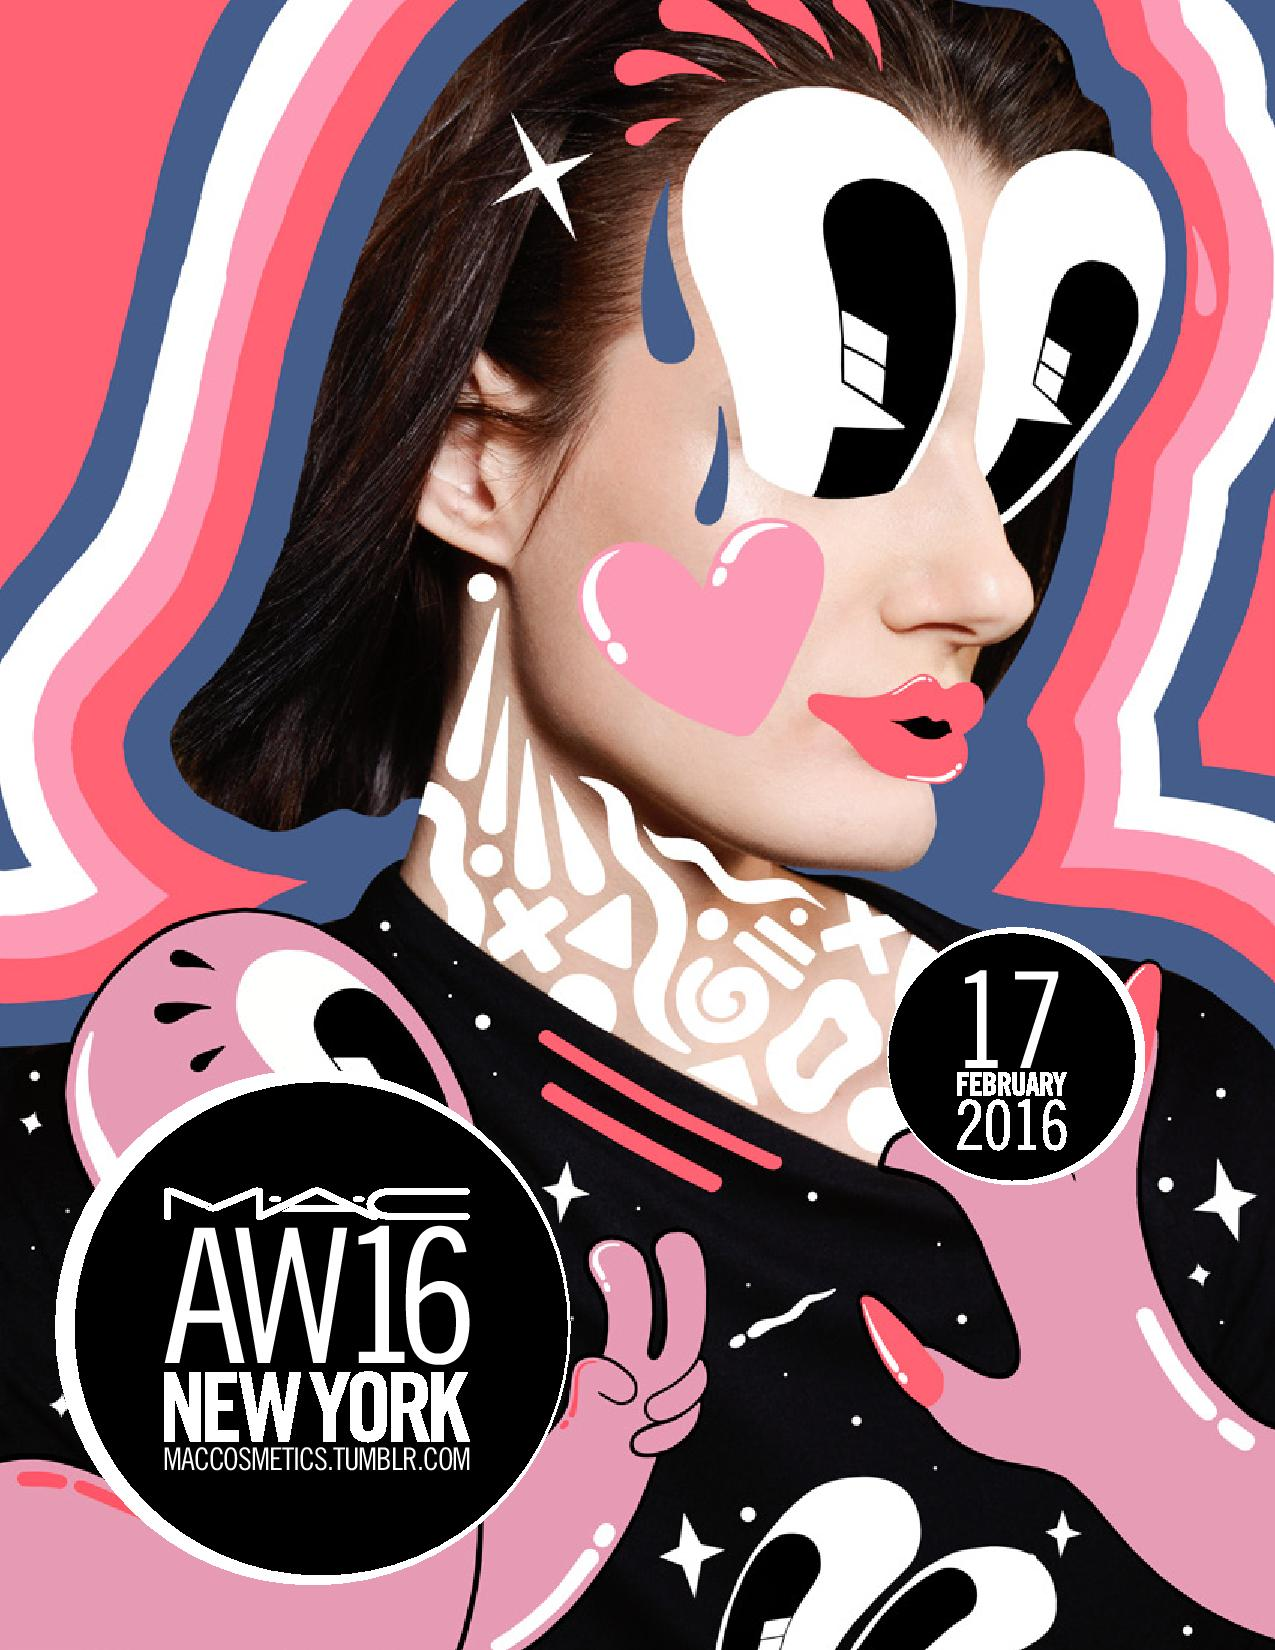 AW16_DAILY FACECHART_NEW YORK_FEB 17 (Delpozo, Michael Kors, Proenza Sch...-page-001